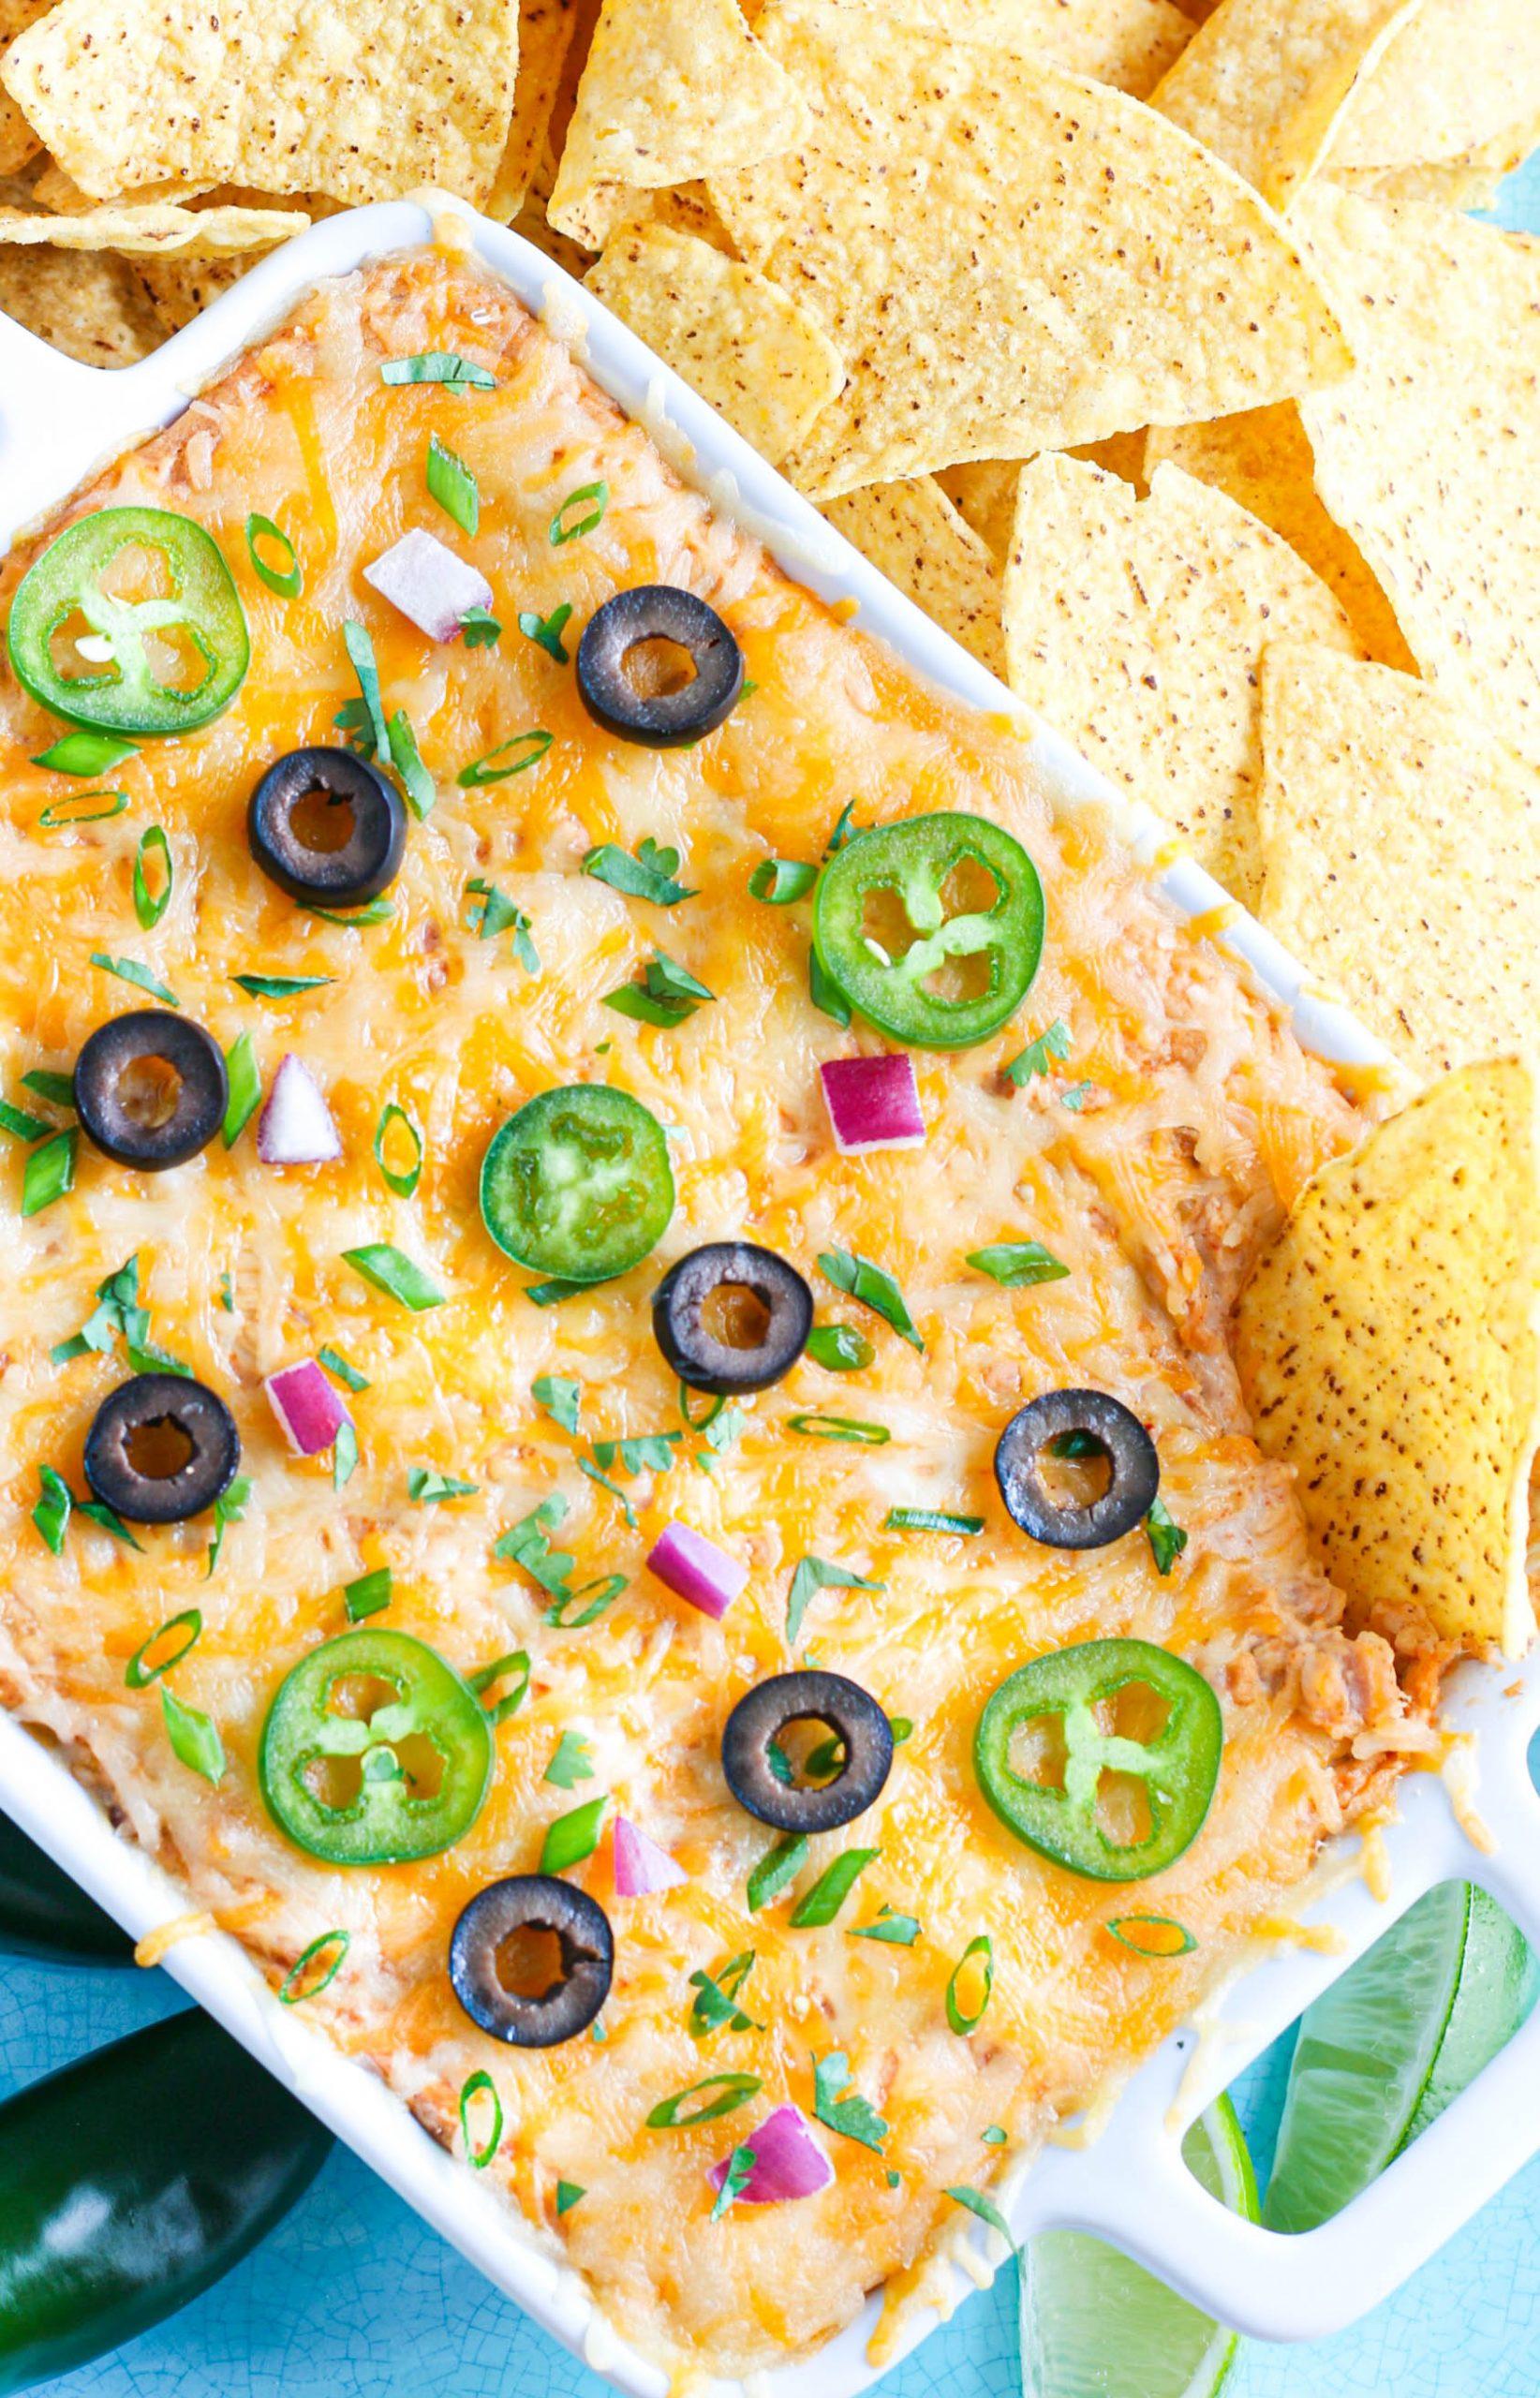 Bean Dip recipe with tortilla chips in white baking dish